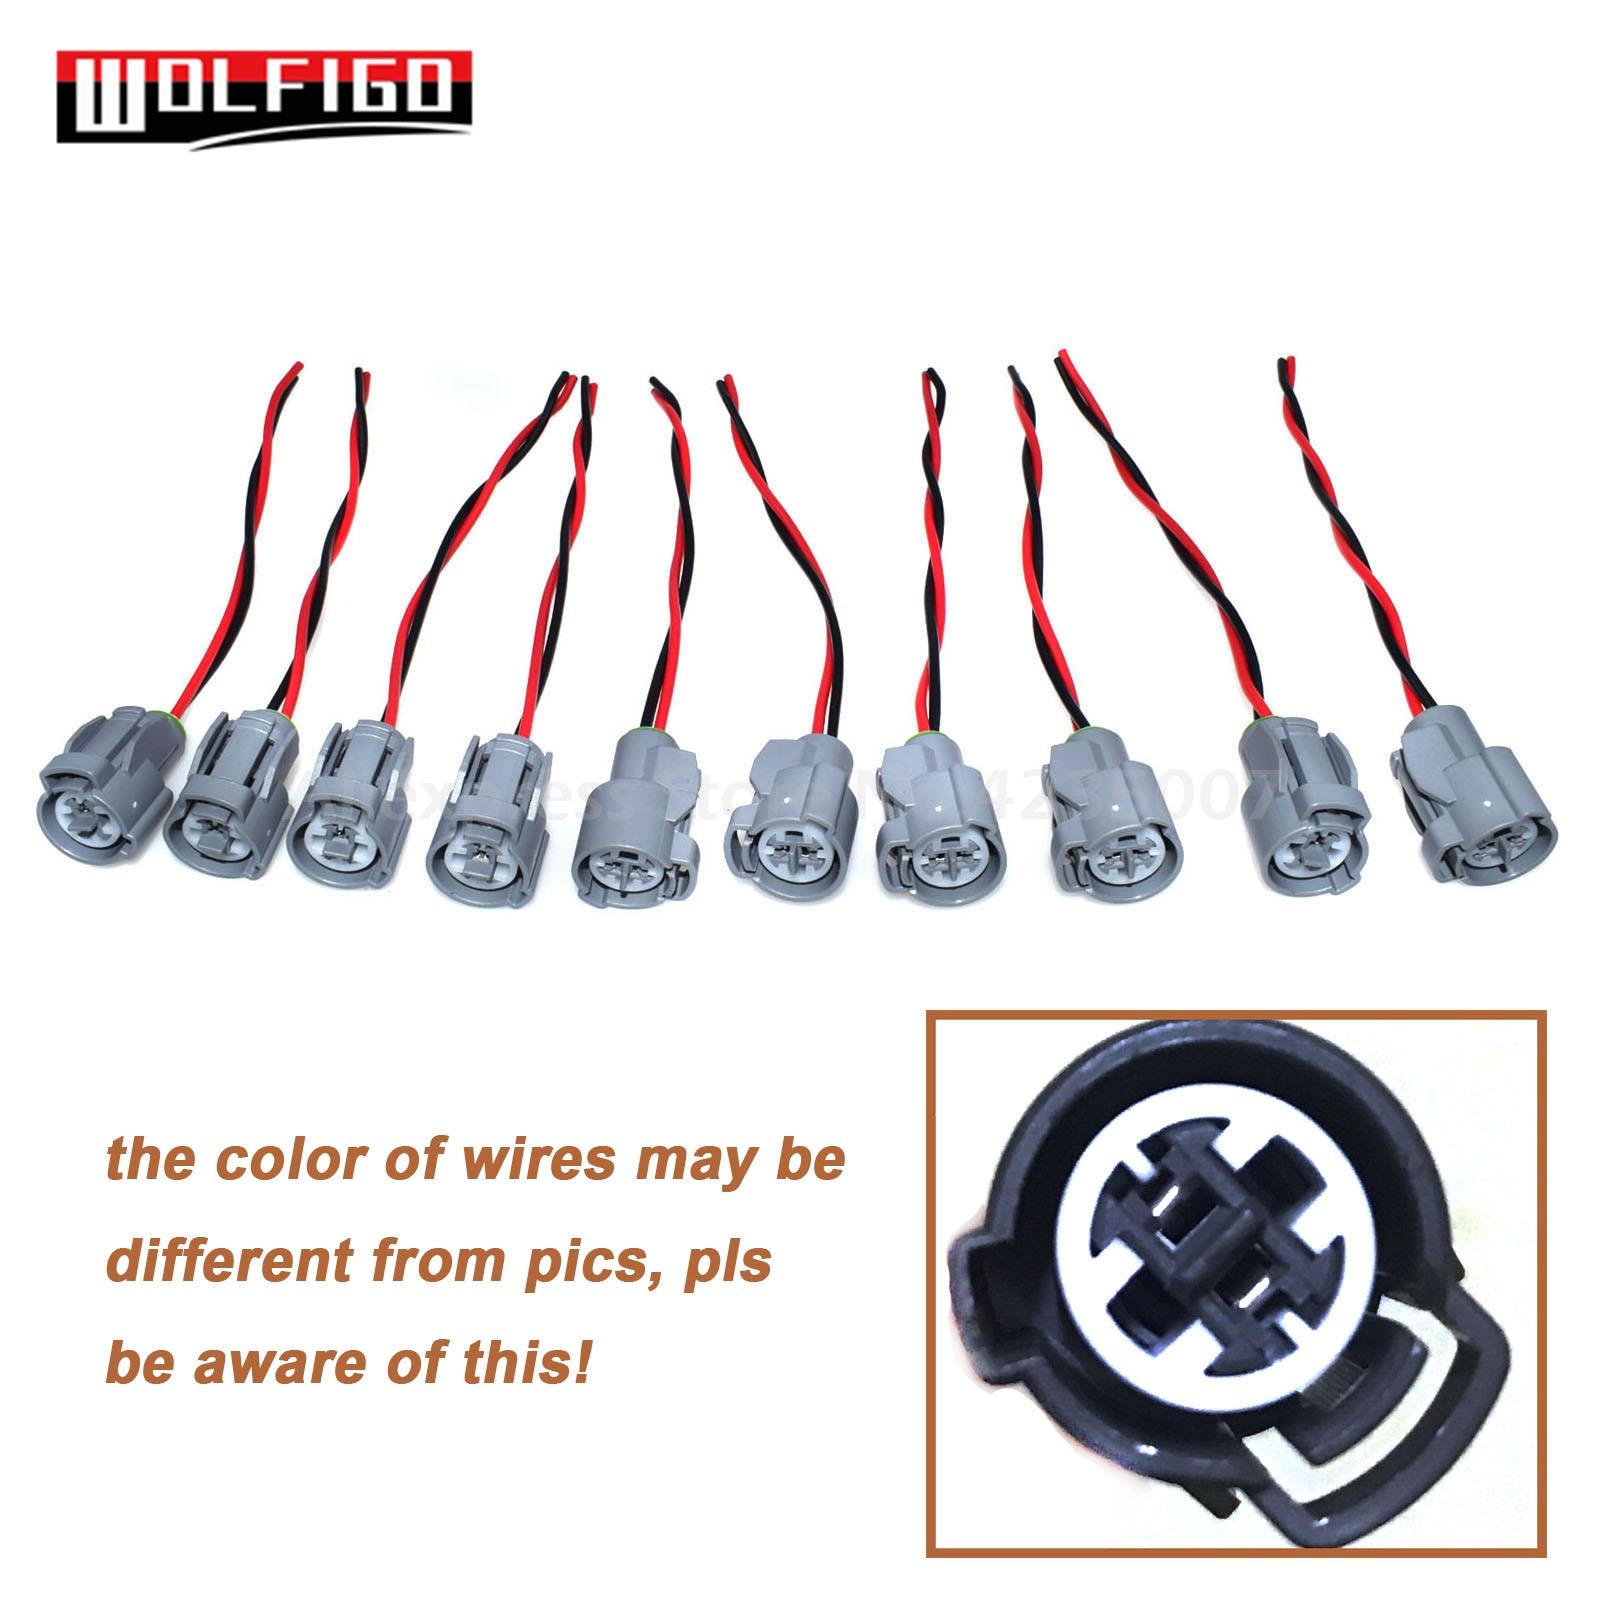 WOLFIGO FOR HONDA INTEGRA CIVIC IAT Intake Air Temperature Fan Knock Coolant Temp Sensor Plug Pigtail/Connector Harness New